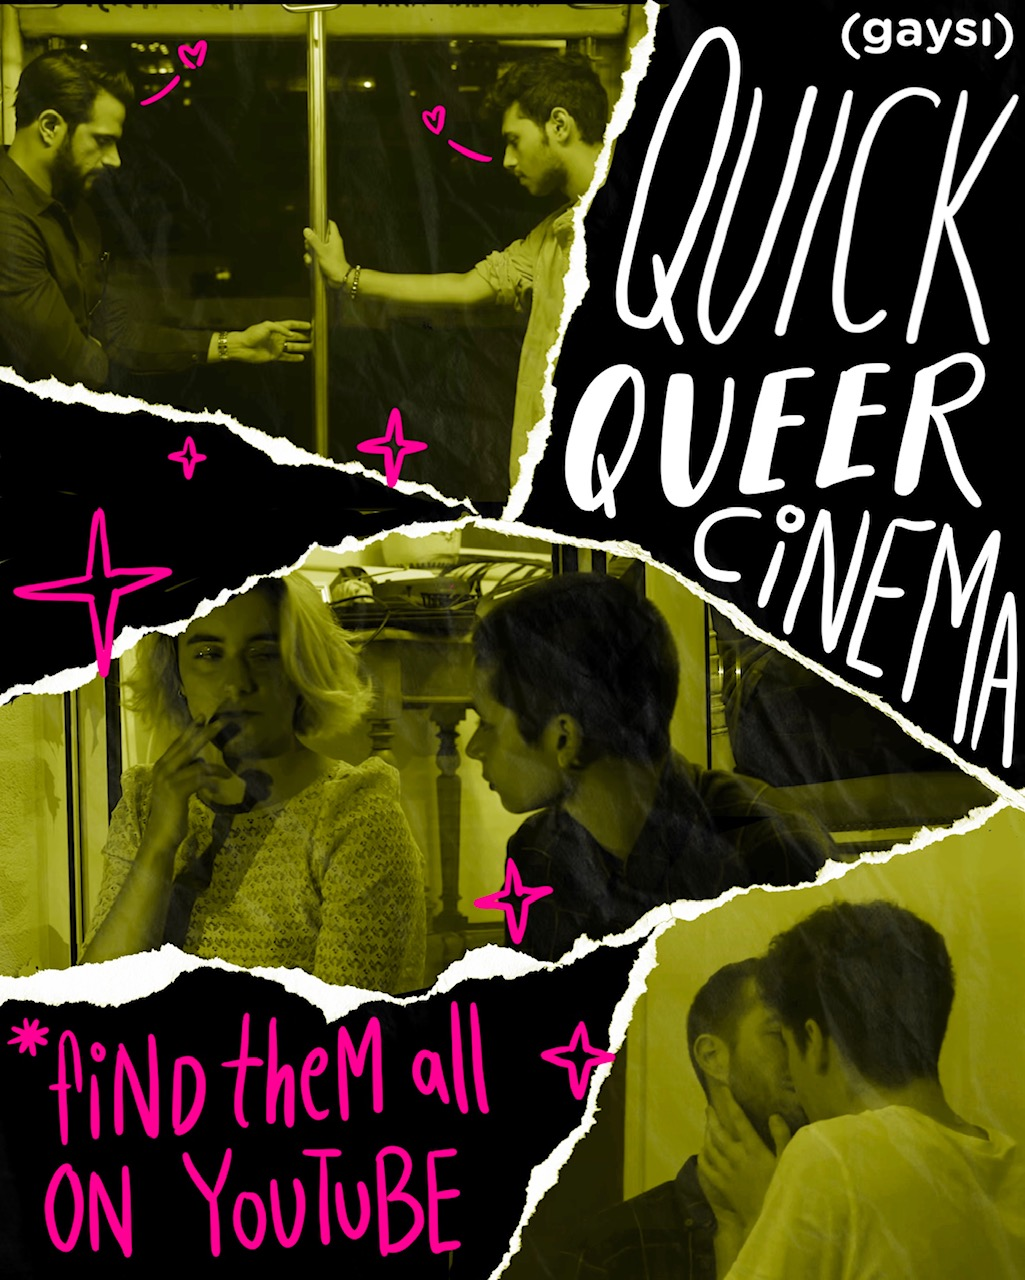 Quick Queer Cinema